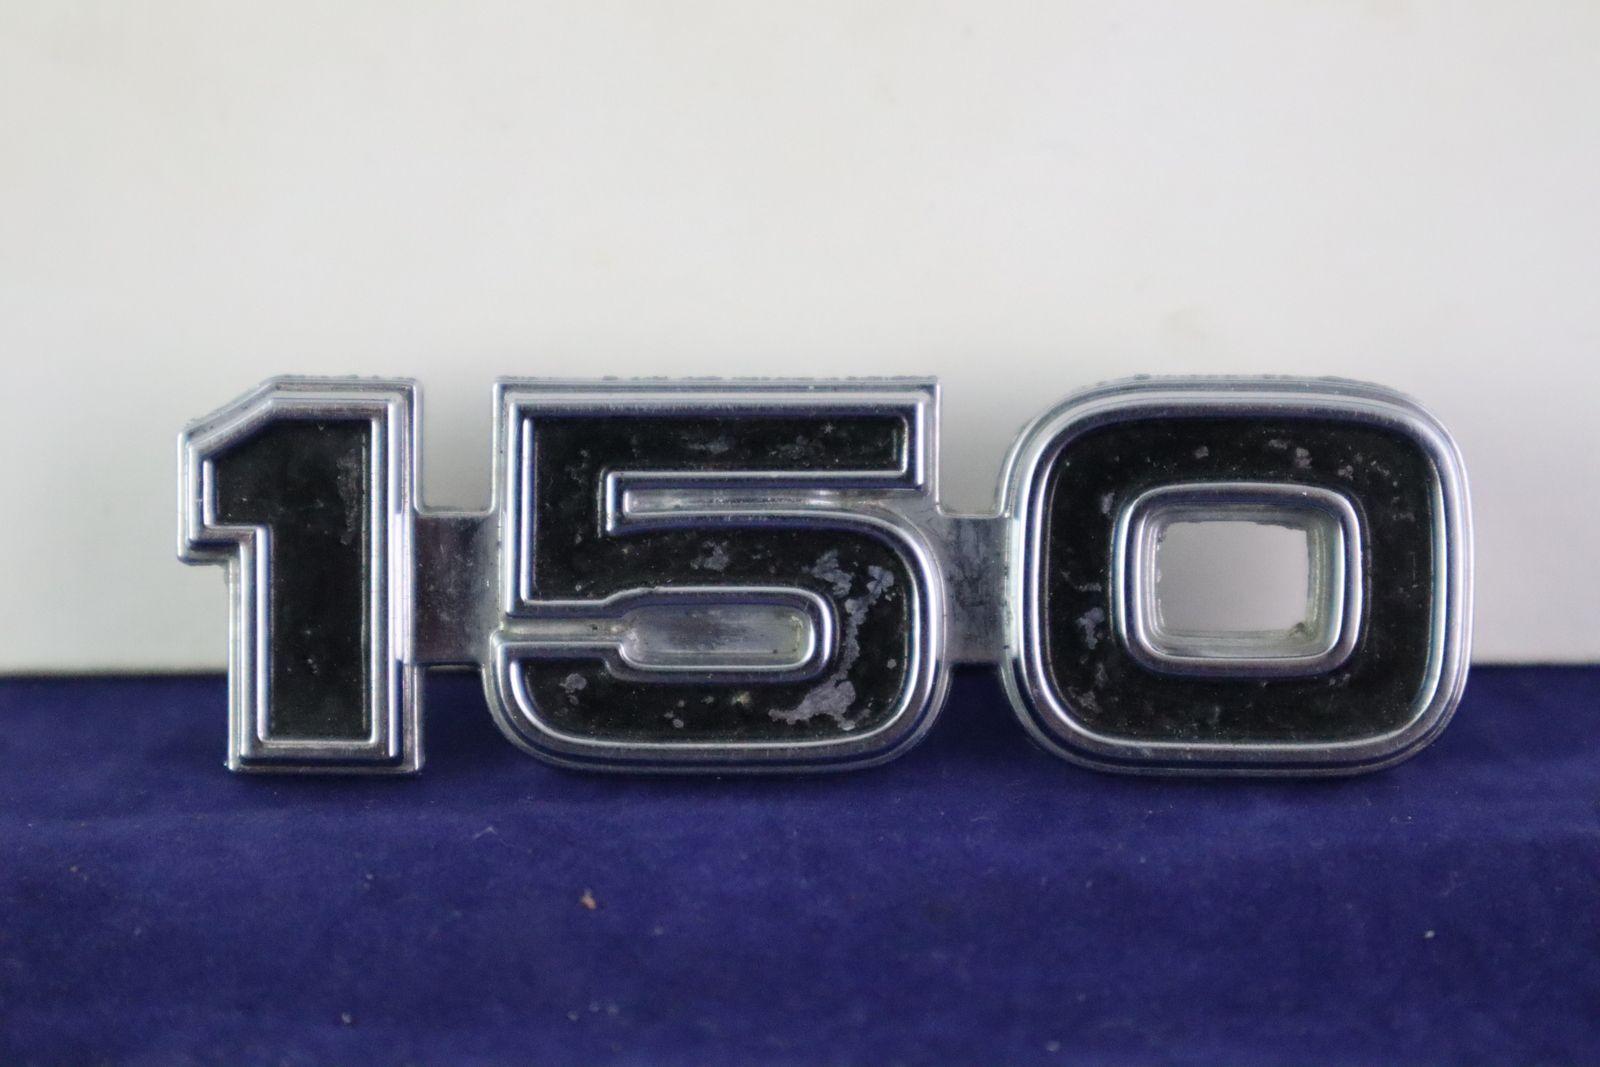 1975 1979 Ford Econoline 150 Metal Fender Emblem Oem D5ub In 2020 Ford Parts Emblems Classic Cars